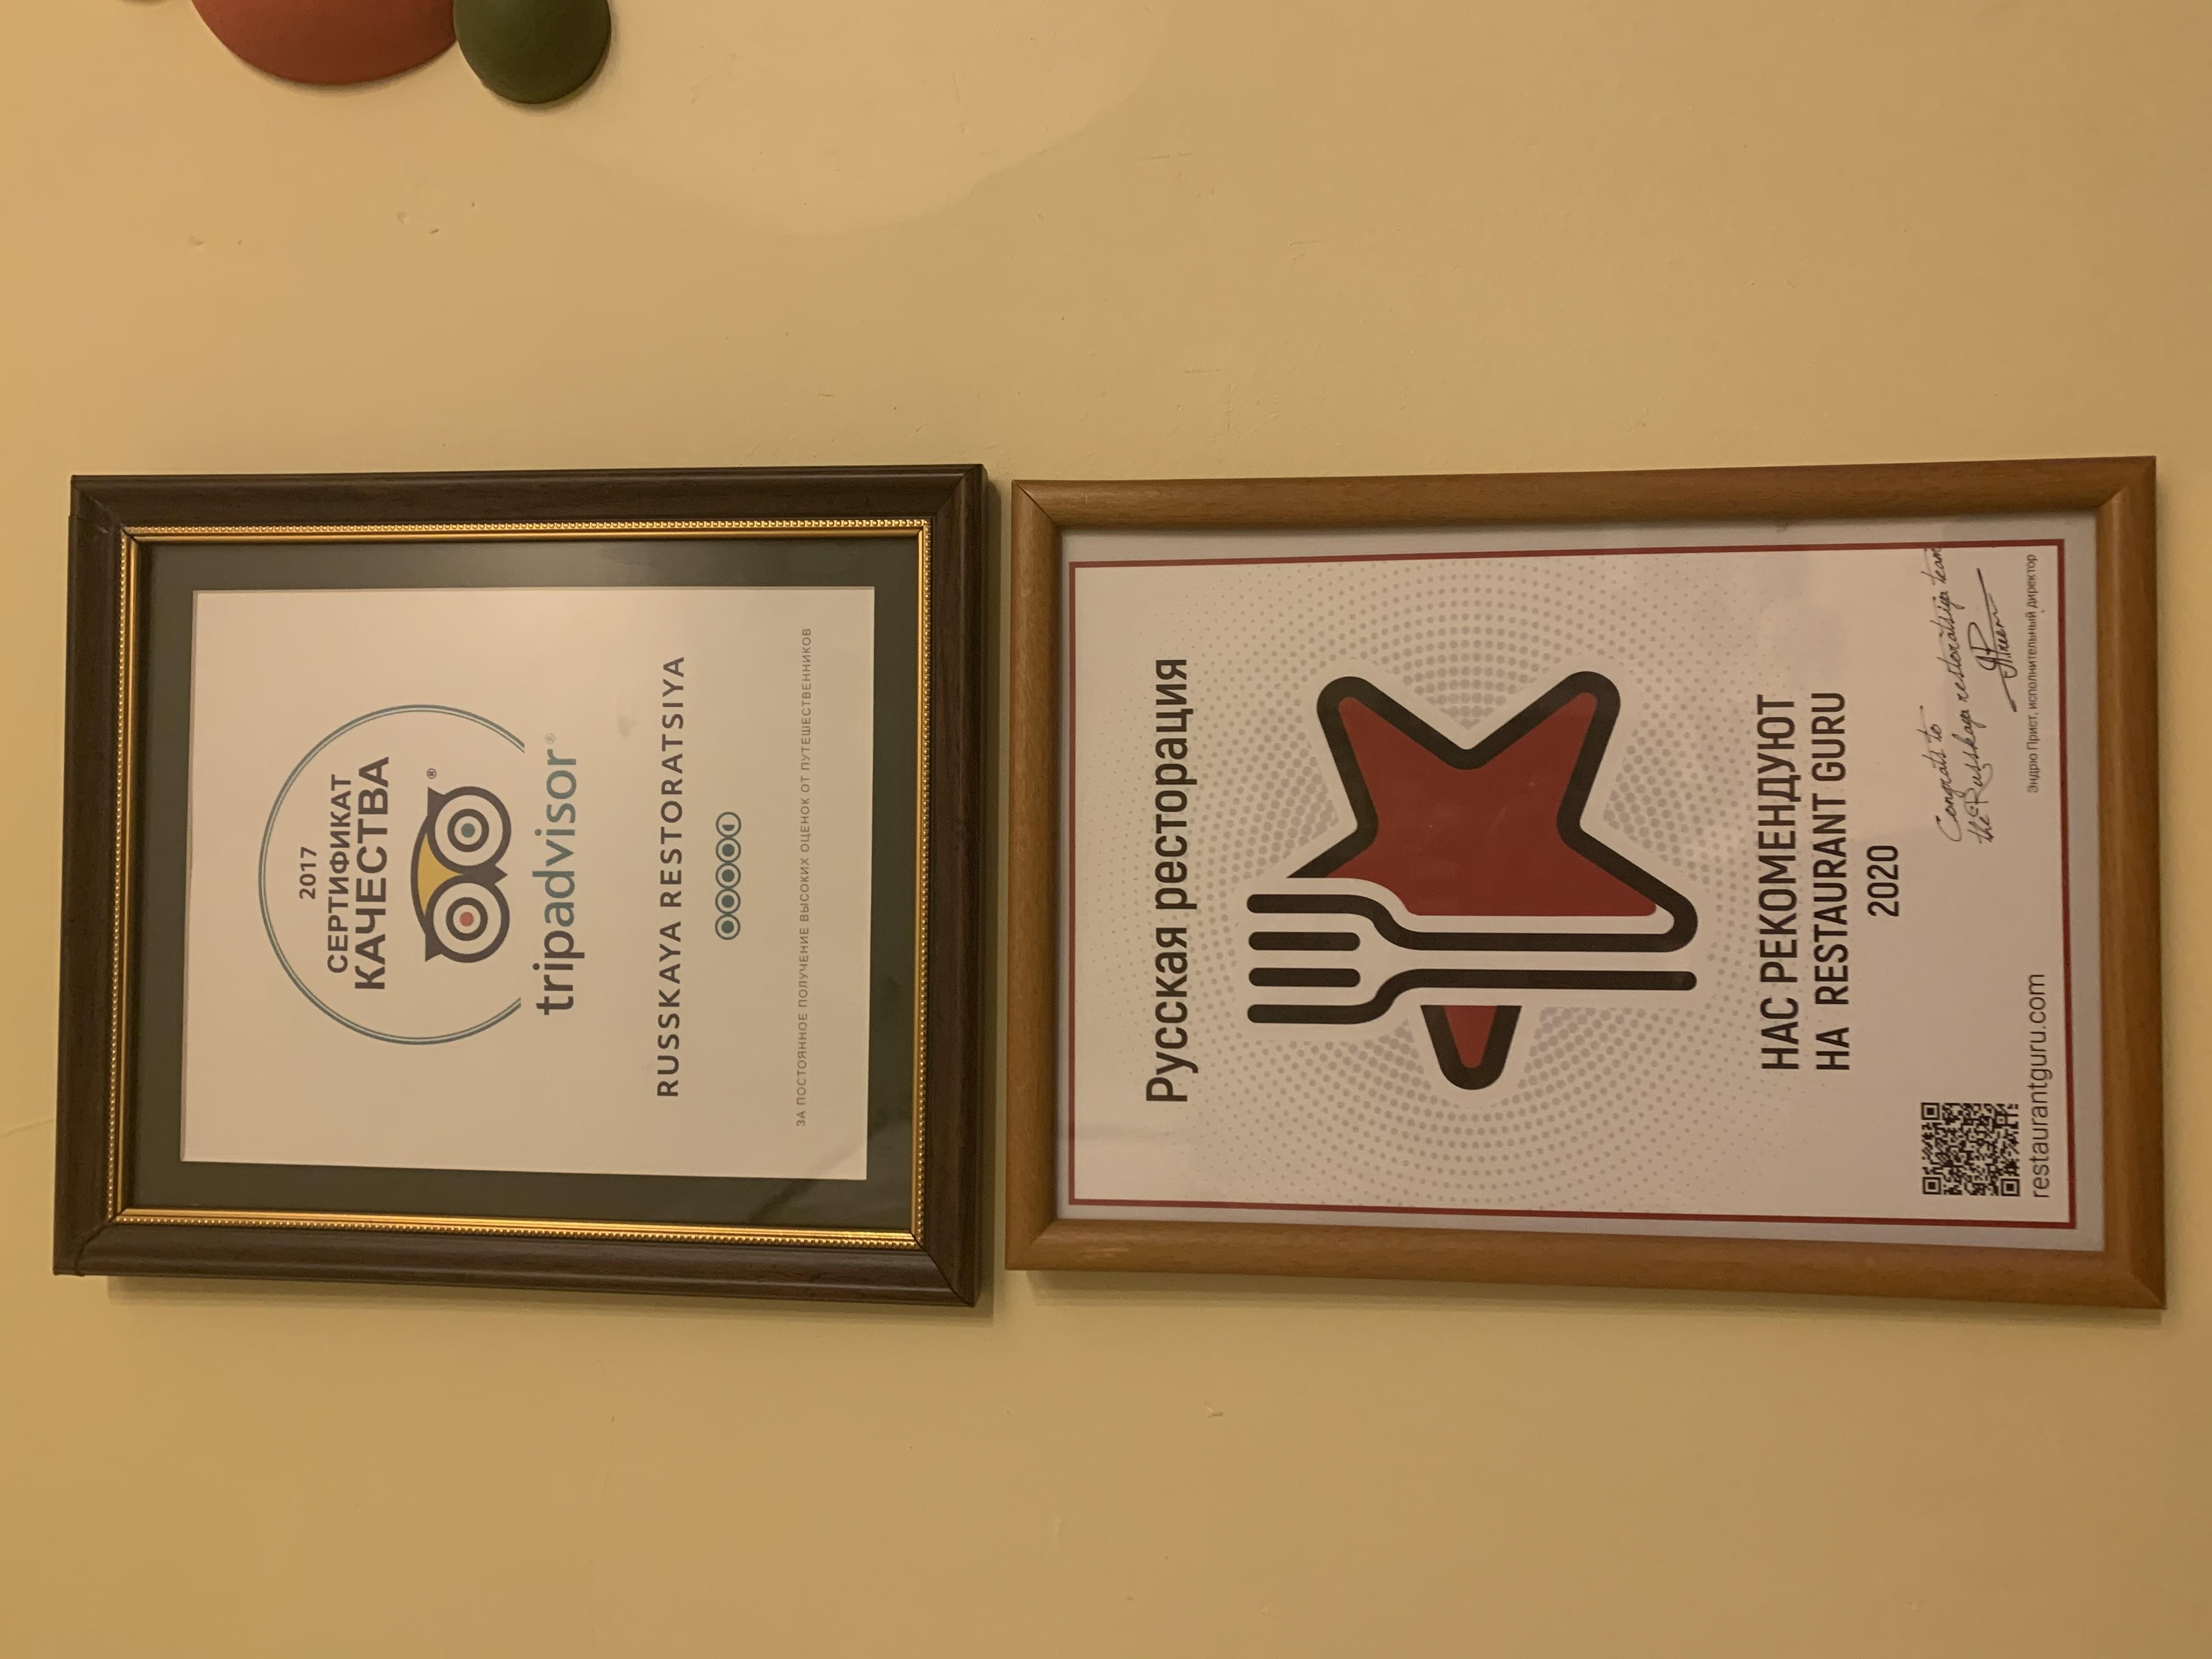 Russkaya Restoratsiya award